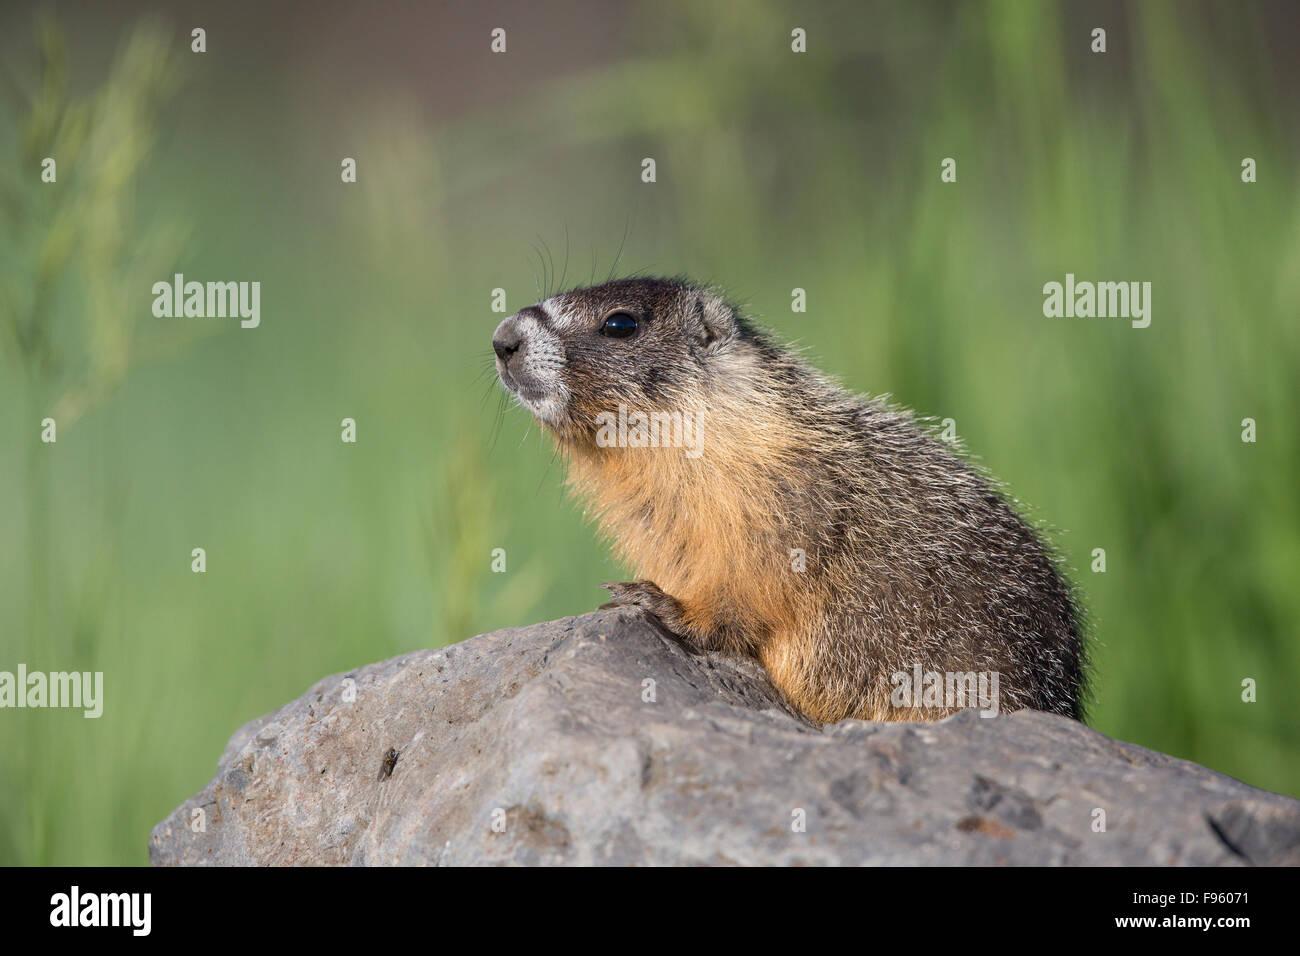 Yellowbellied marmot (Marmota flaviventris), near Tunkwa Lake, British Columbia. - Stock Image